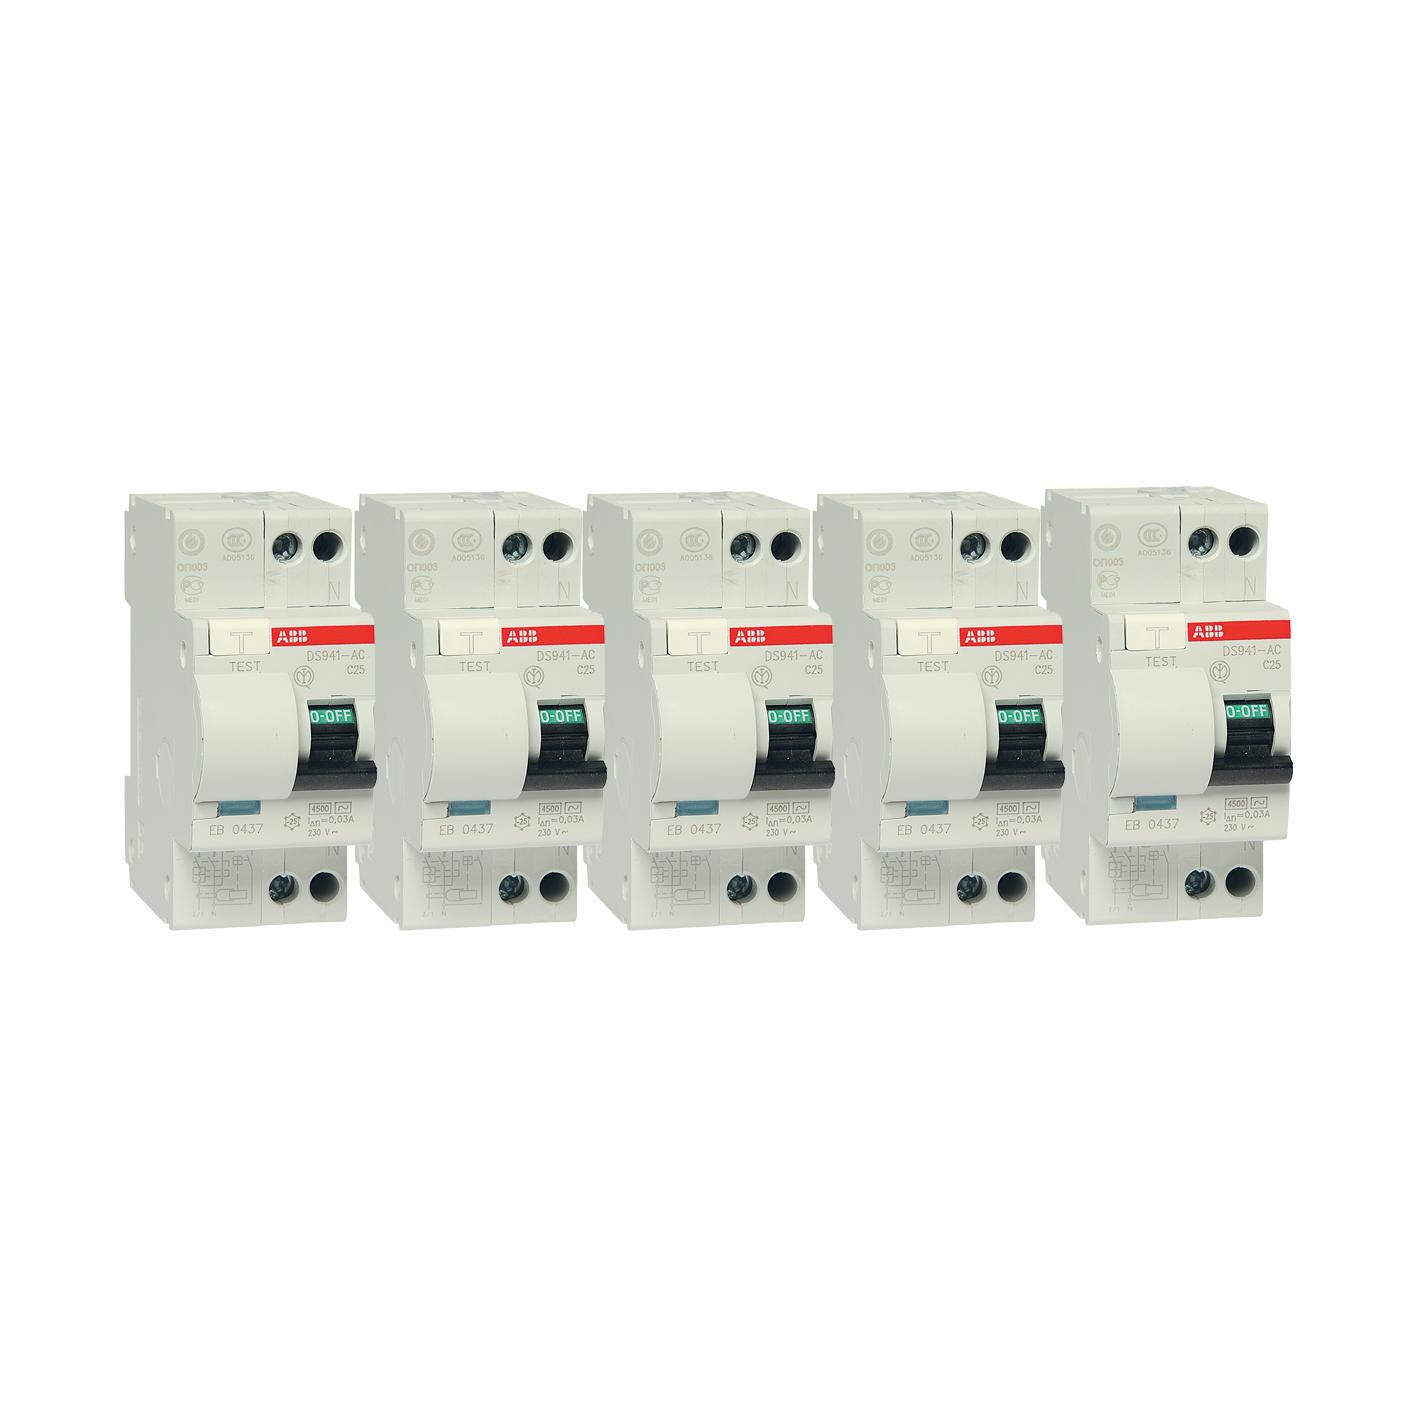 Kit Interruttore magnetotermico differenziale ABB DS 901 1 polo 25A 4.5kA 30mA AC 2 moduli 230V, 5 pezzi - 3